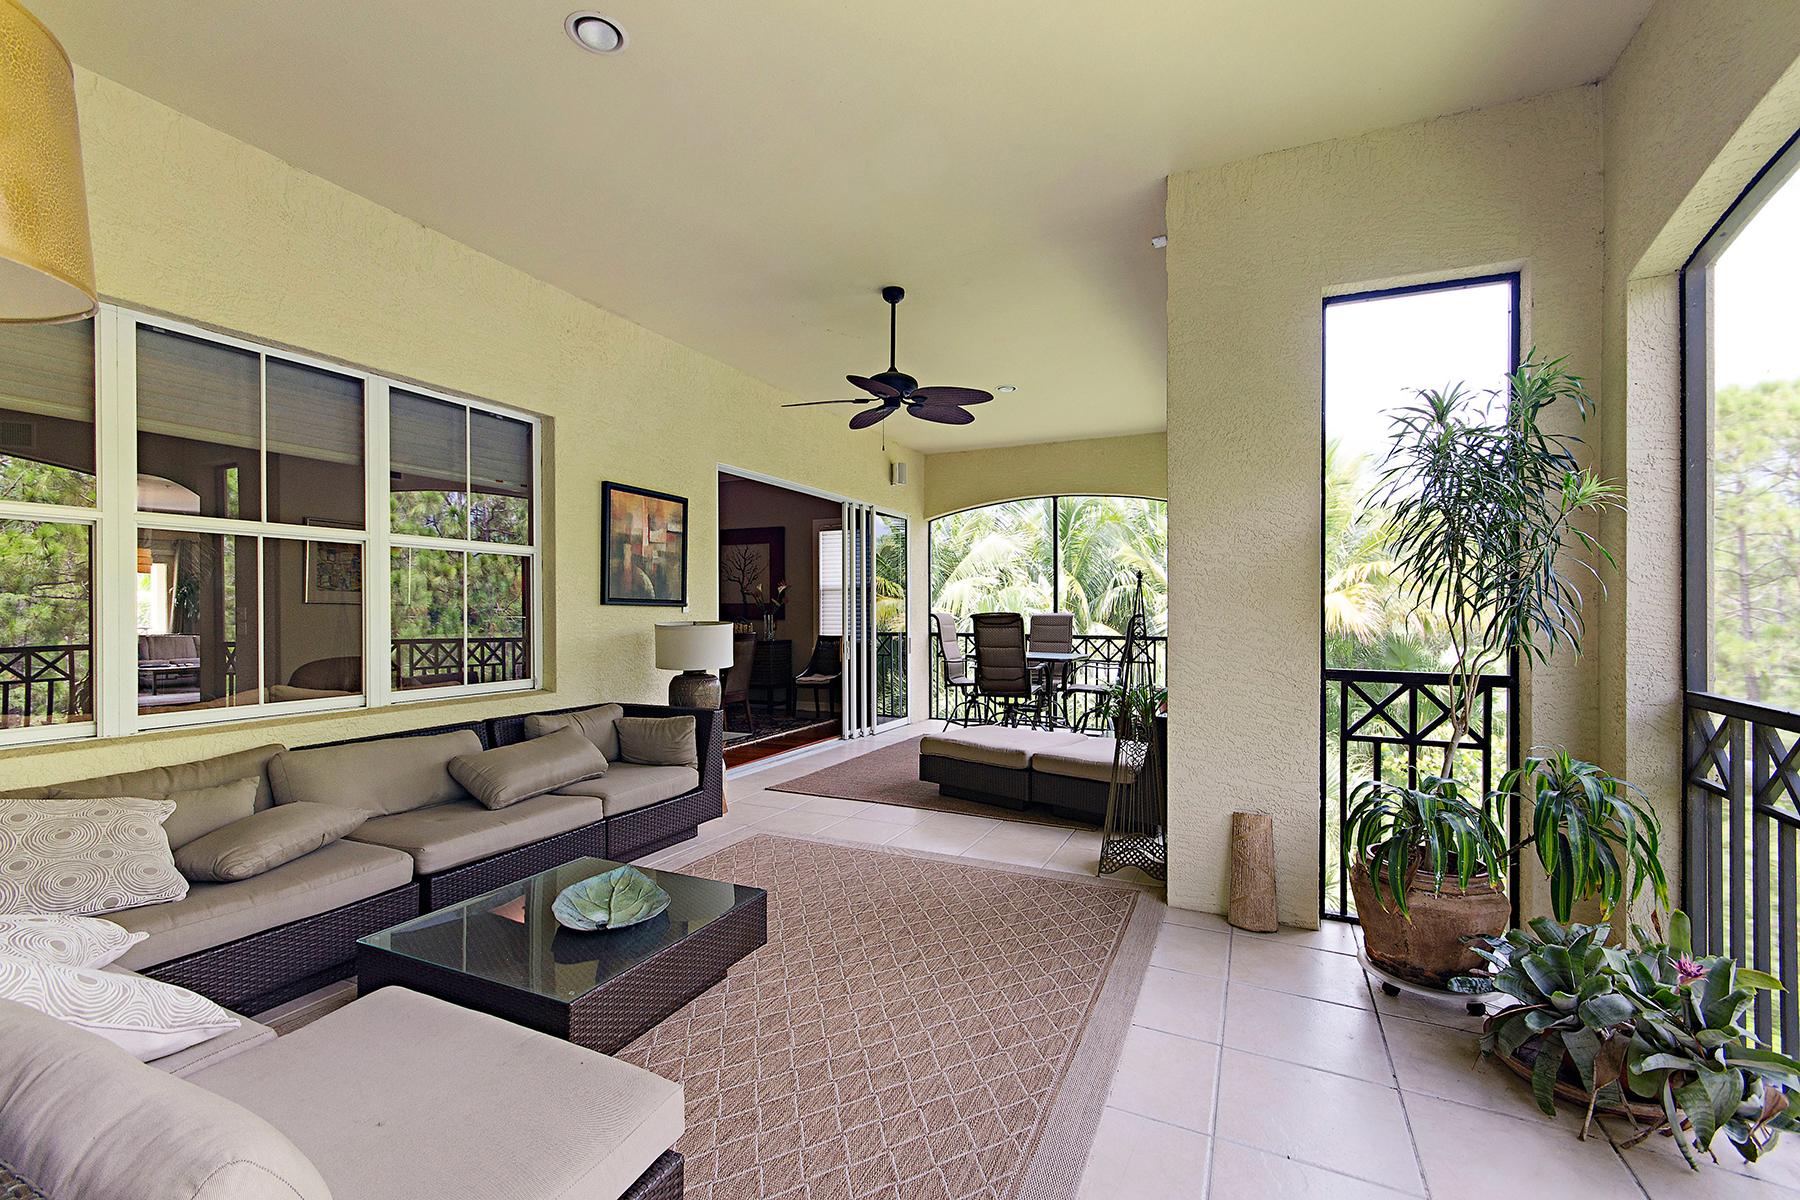 Condominium for Sale at CASTILLO AT TIBURON 2805 Tiburon Blvd E 1-103 Naples, Florida, 34109 United States